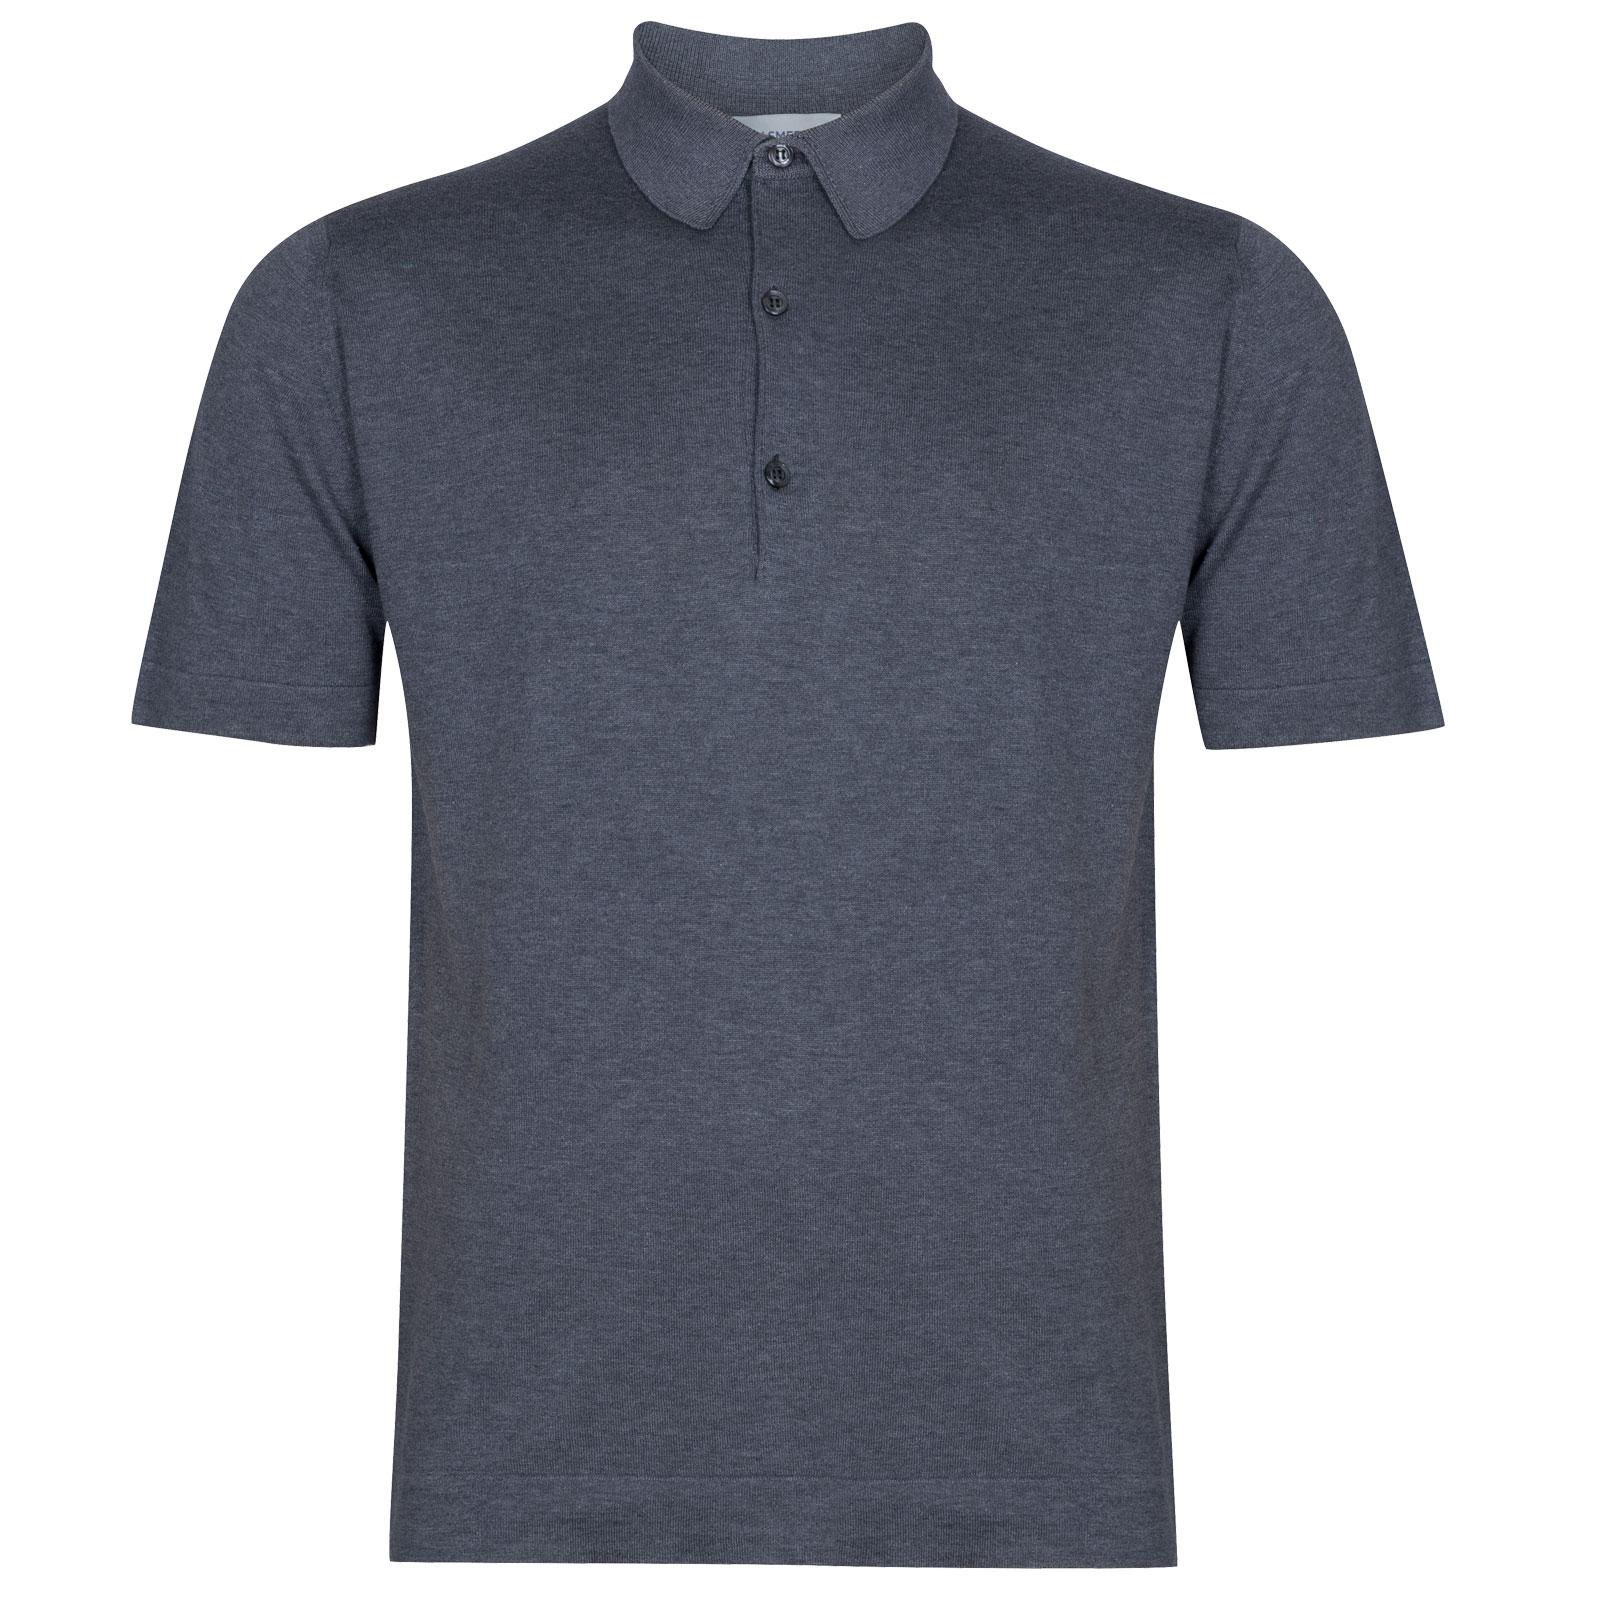 John Smedley Mycroft in Charcoal Shirt-LGE